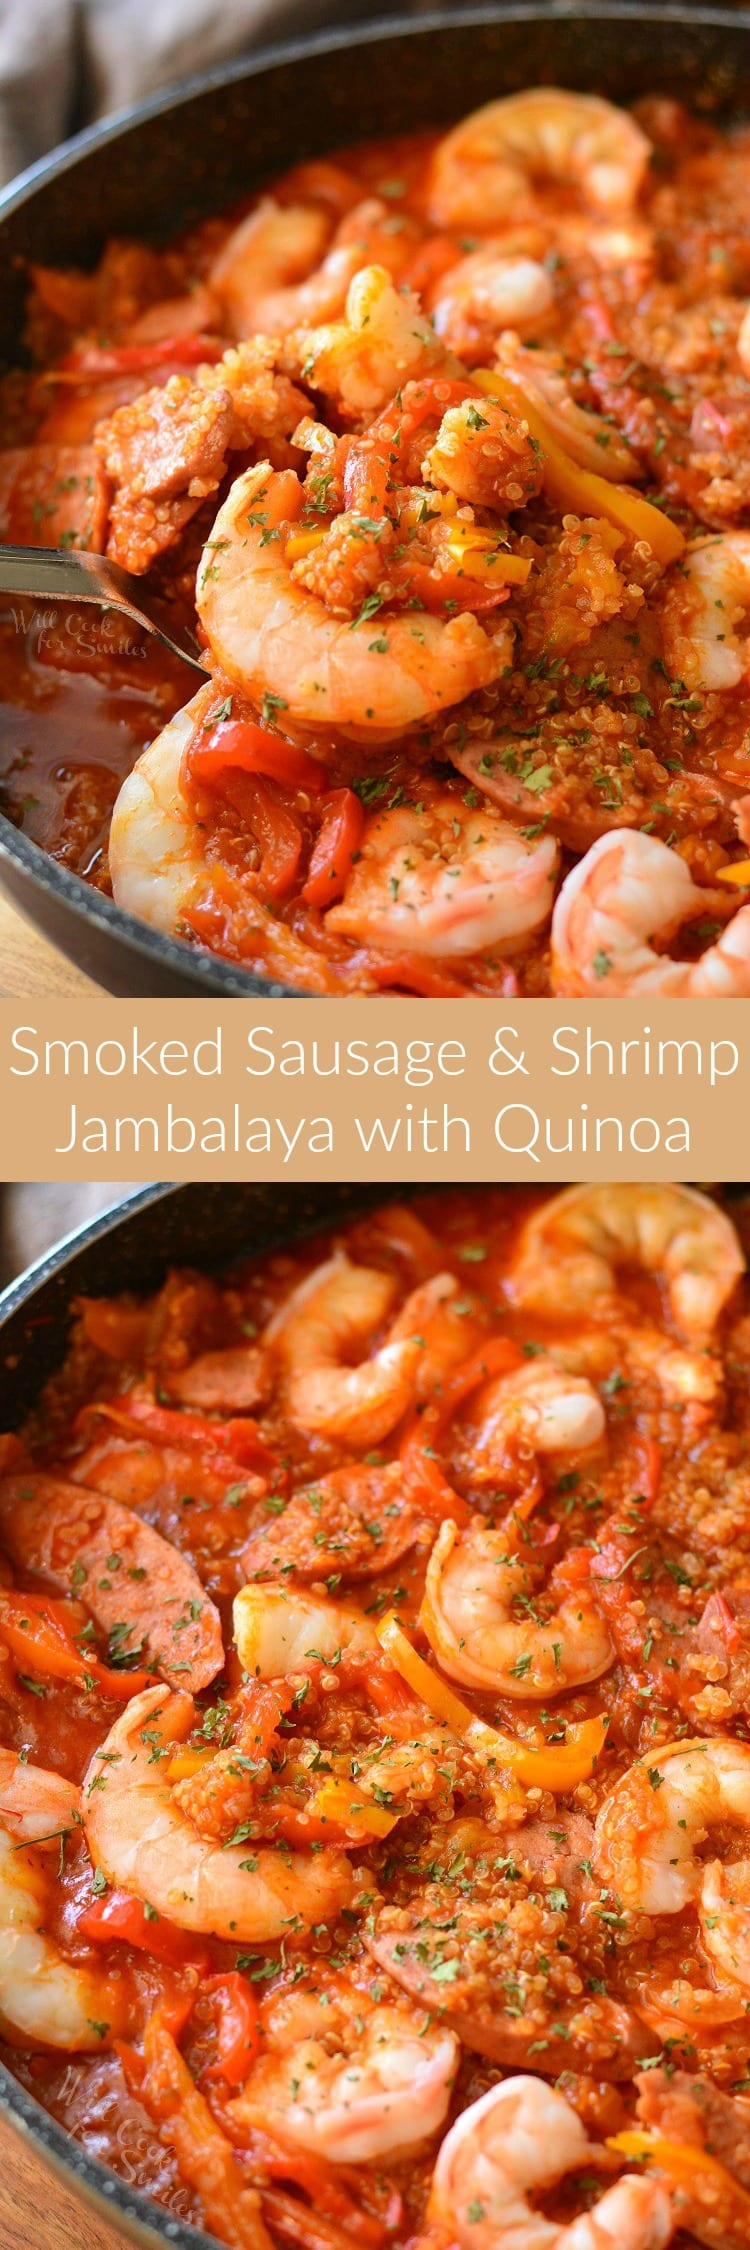 Smoked Sausage and Shrimp Jambalaya with Quinoa. This LIGHT and EASY Jambalaya is made with quinoa, fresh, jumbo shrimp, smoked sausage, veggies, and spiced with Cajun seasoning. #jambalaya #shrimp #sausage #quinoarecipe